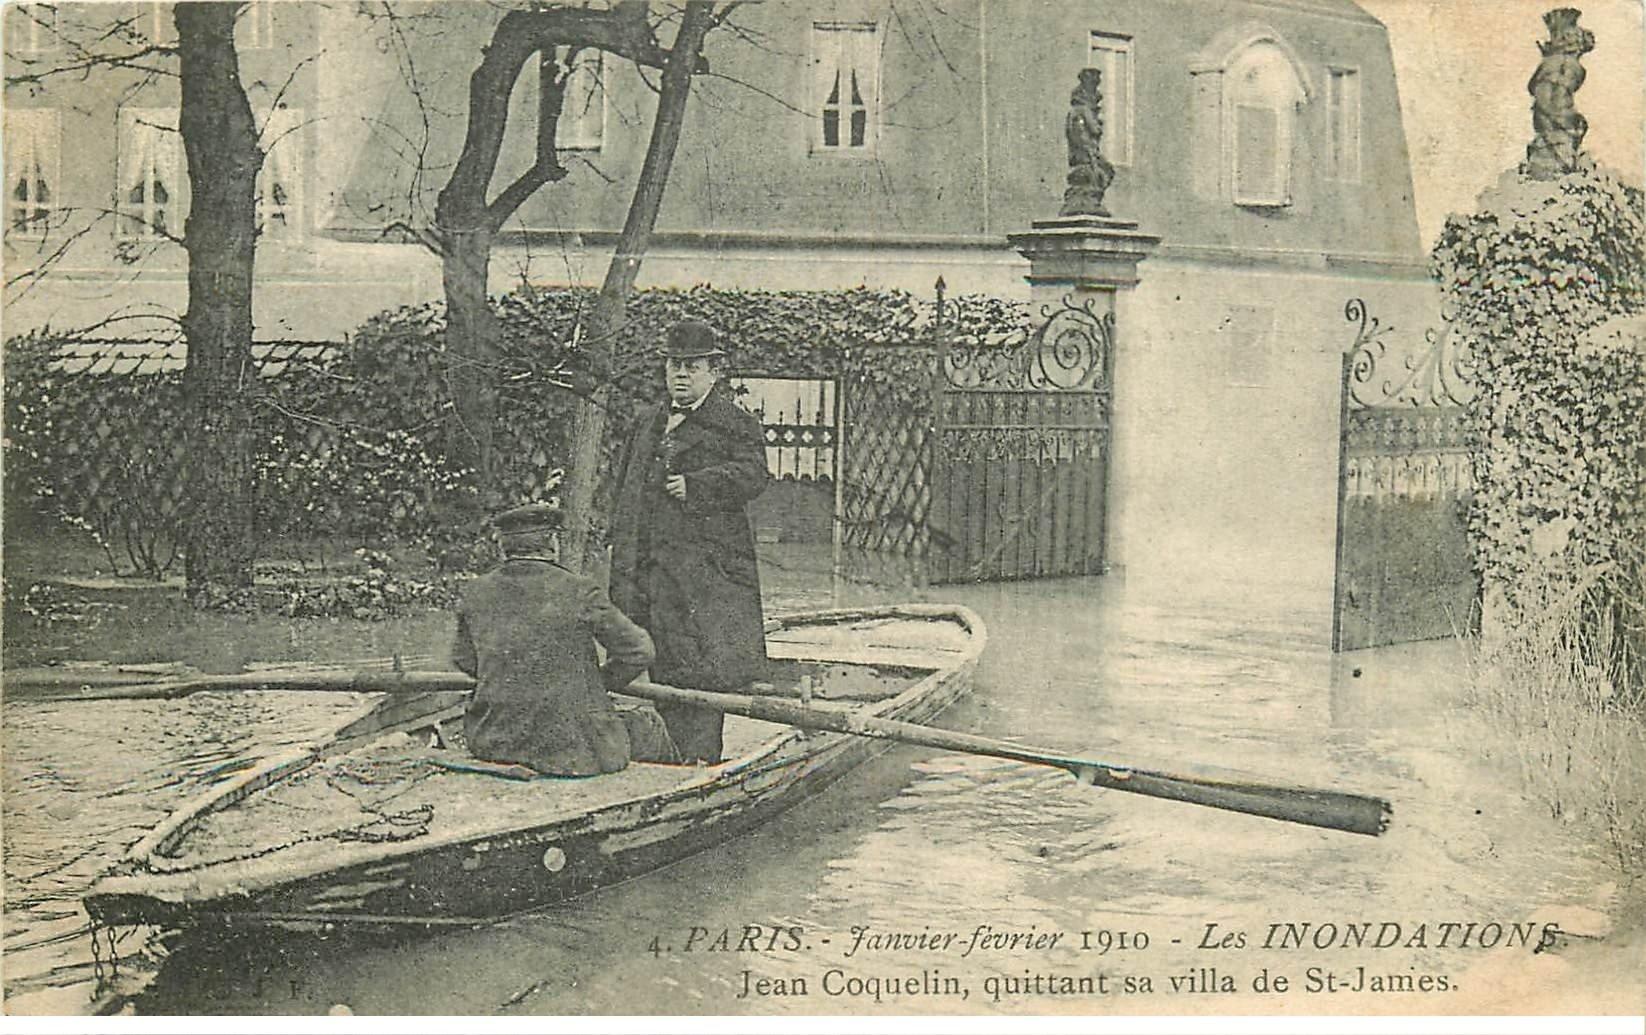 INONDATION ET CRUE DE PARIS 1910. Coquelin quittant sa Villa Saint-James